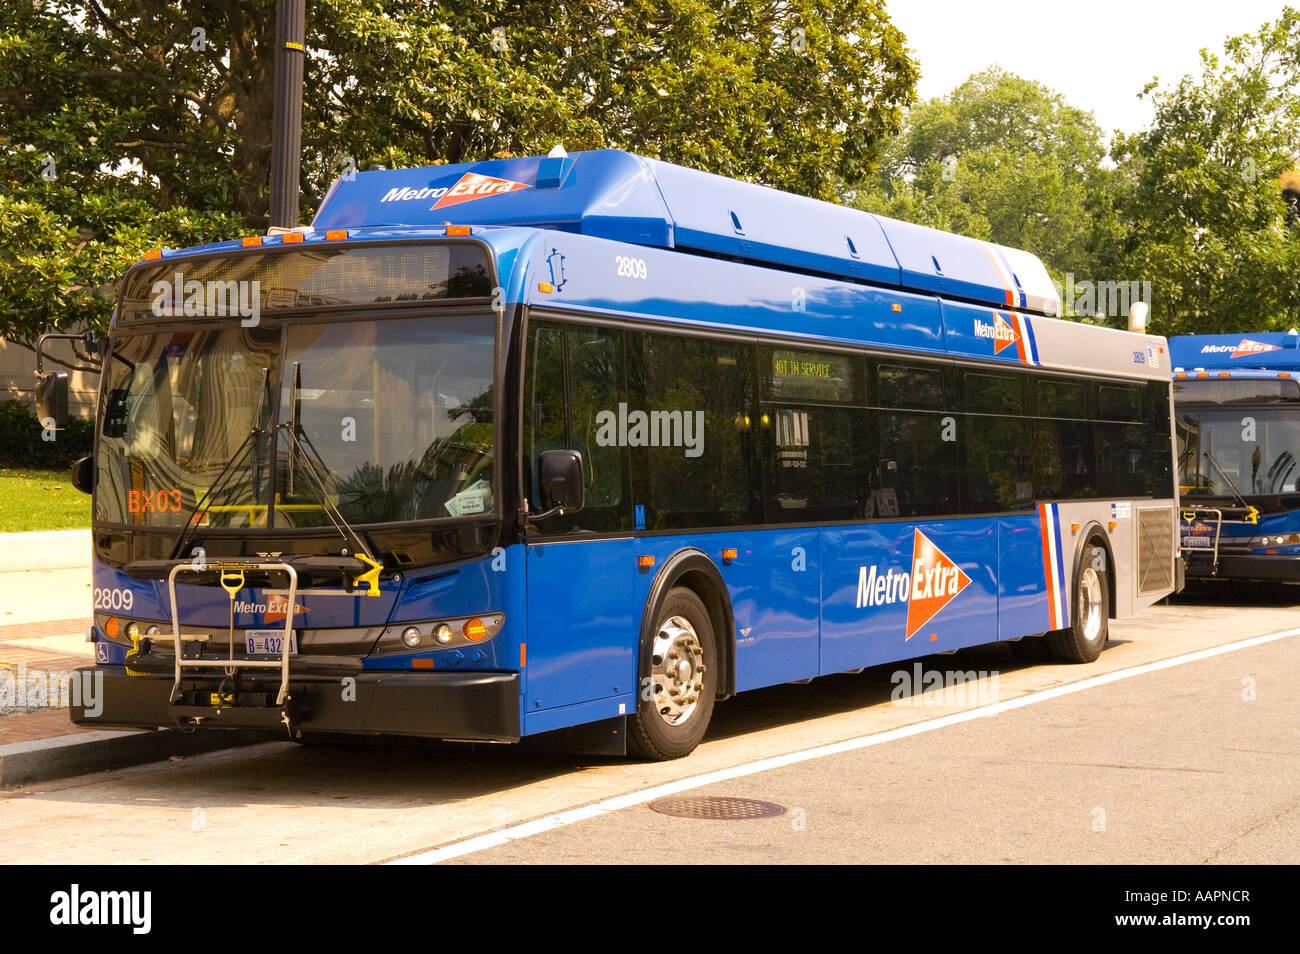 Metro Bus Cleaners Dc : Blue metro extra bus line washington dc usa stock photo